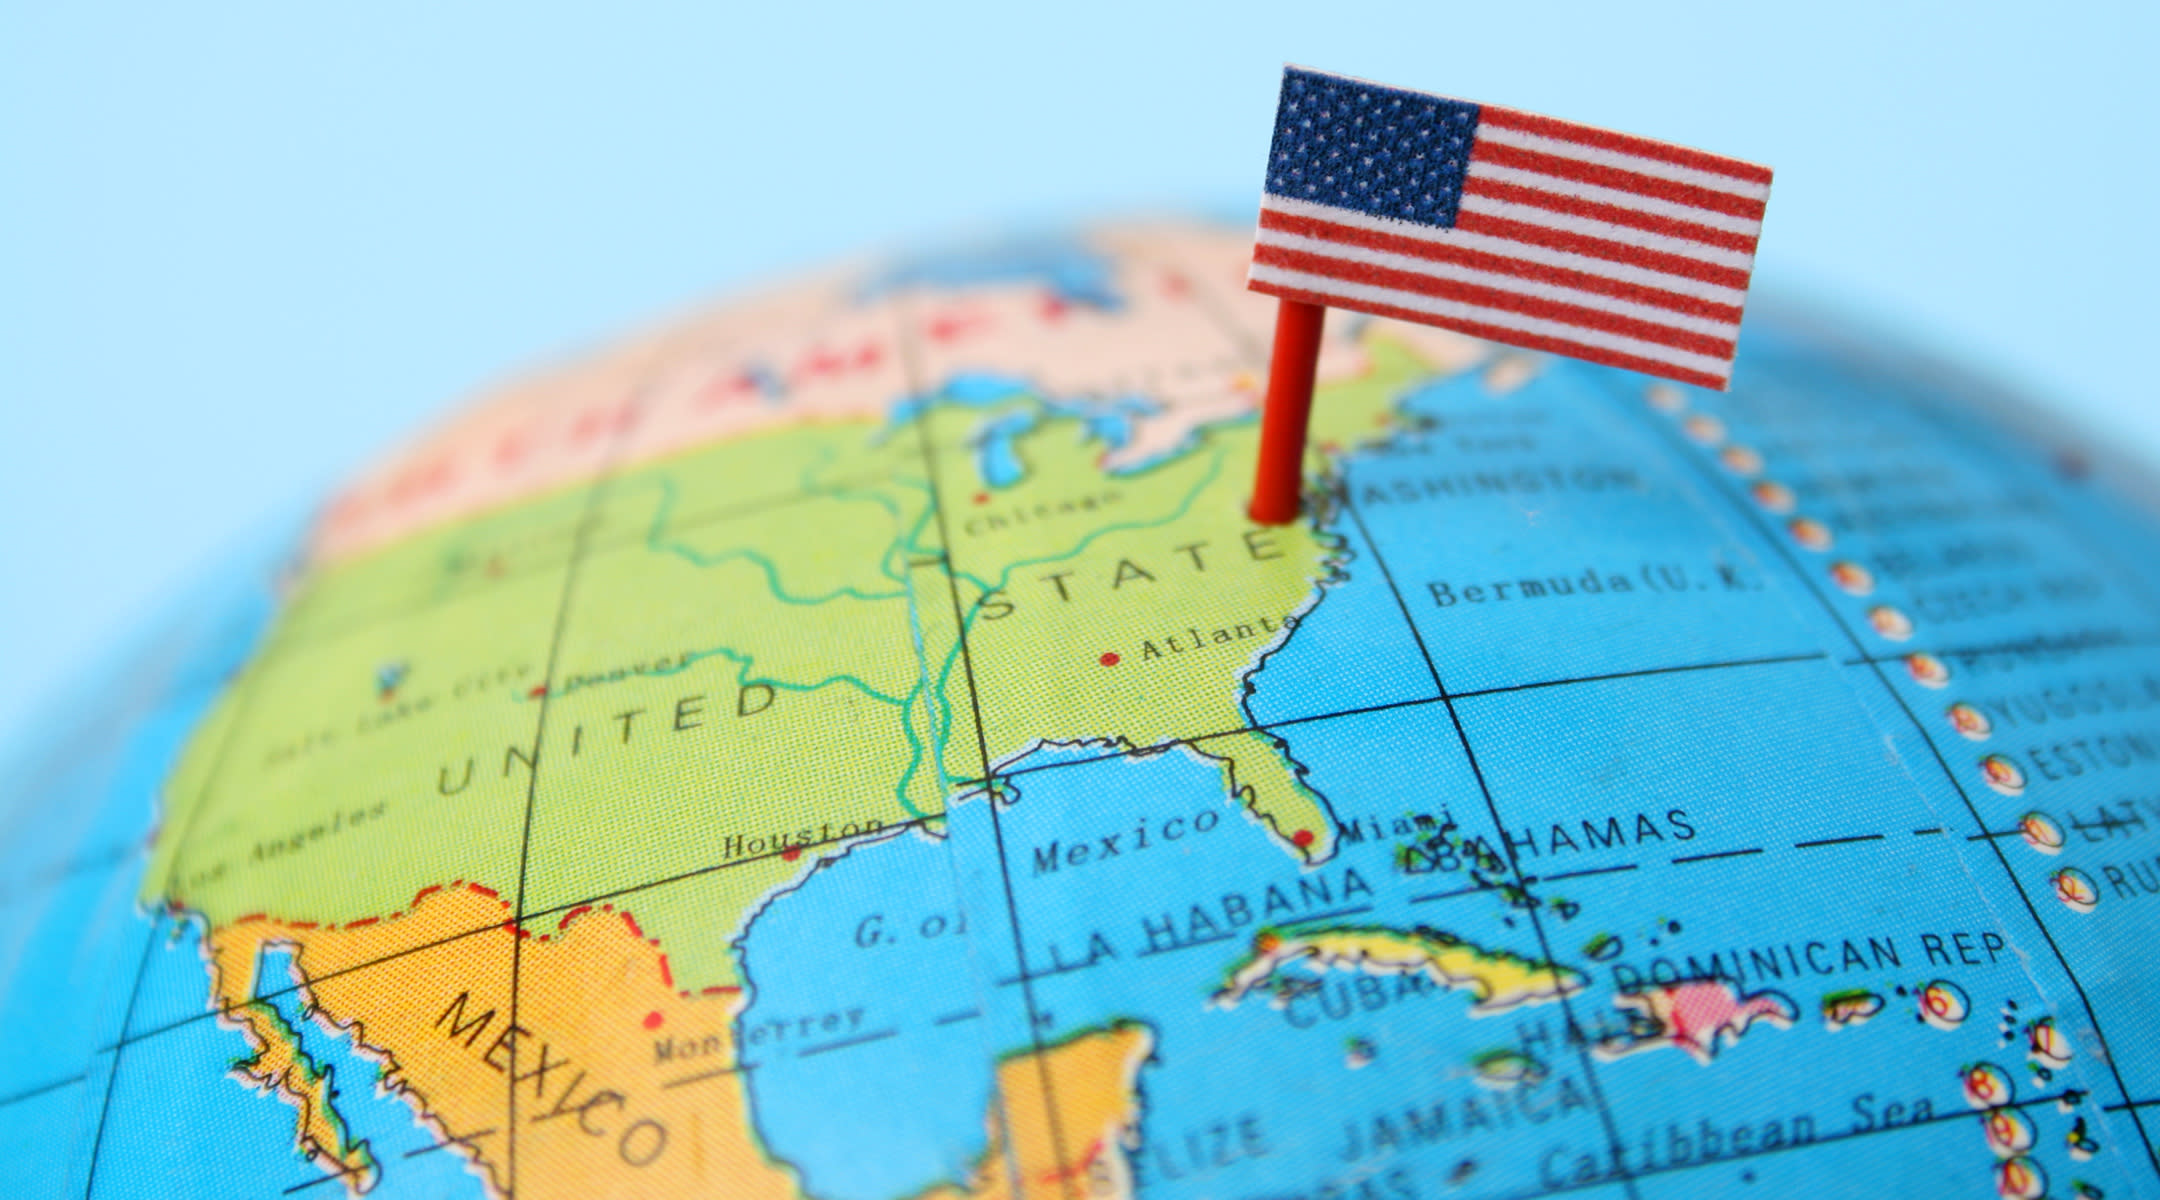 globe positioned united states flag placed near Carolinas